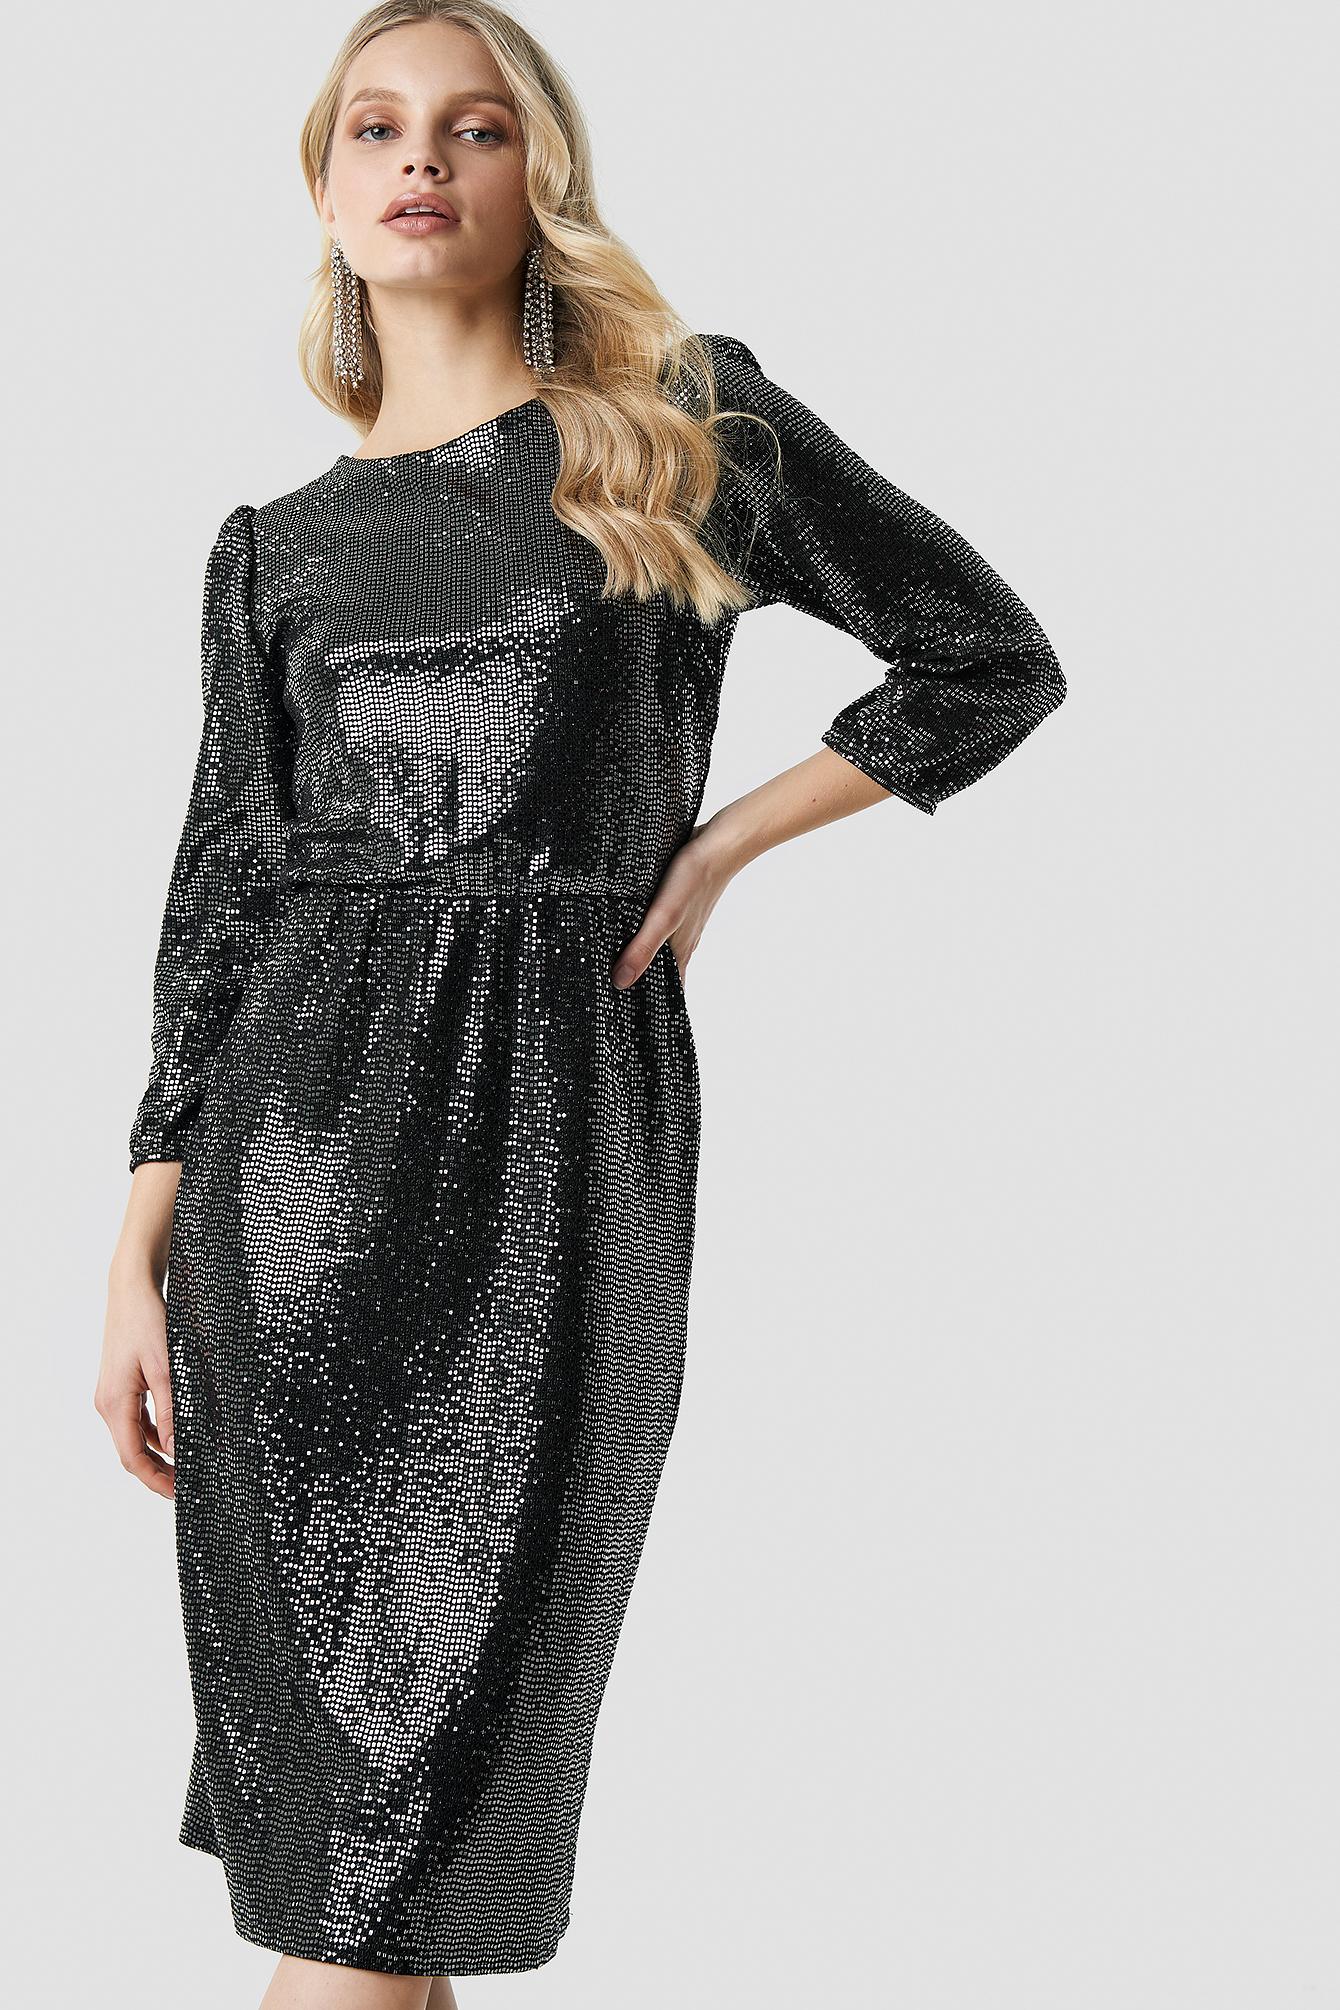 sisters point -  Necca Dress - Black